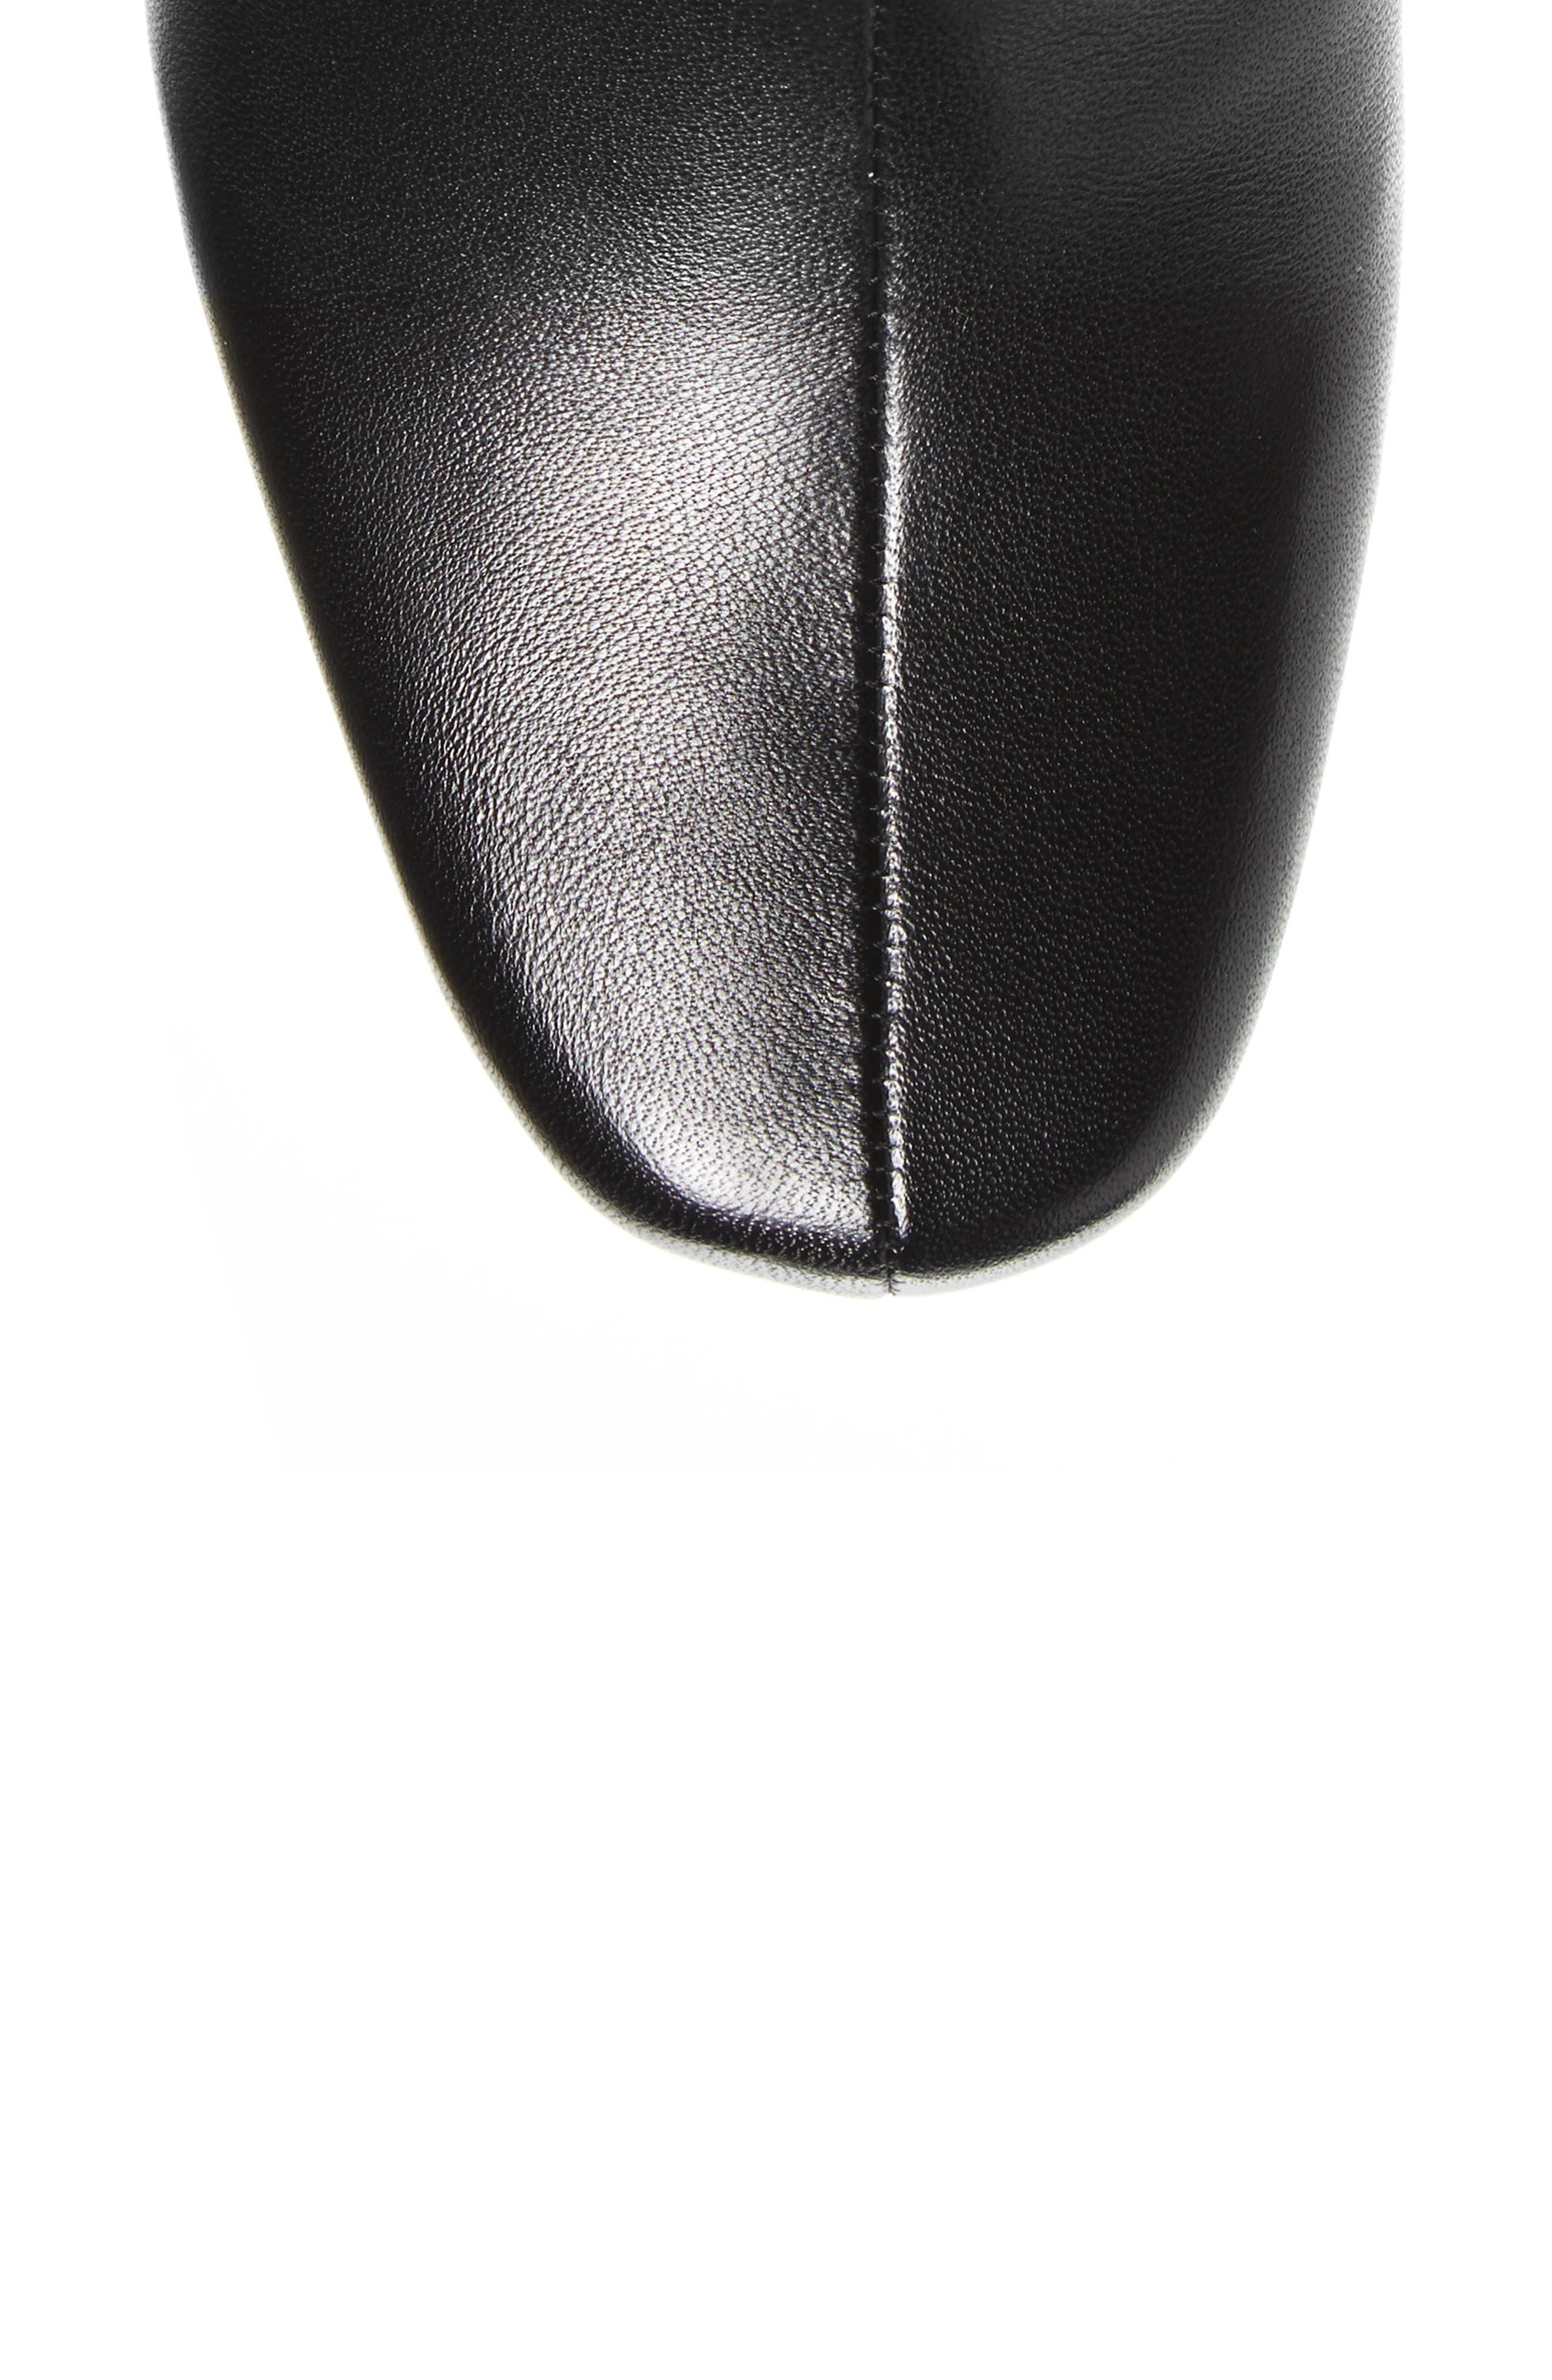 Tacoma 18 Tall Boot,                             Alternate thumbnail 5, color,                             BLACK LEATHER